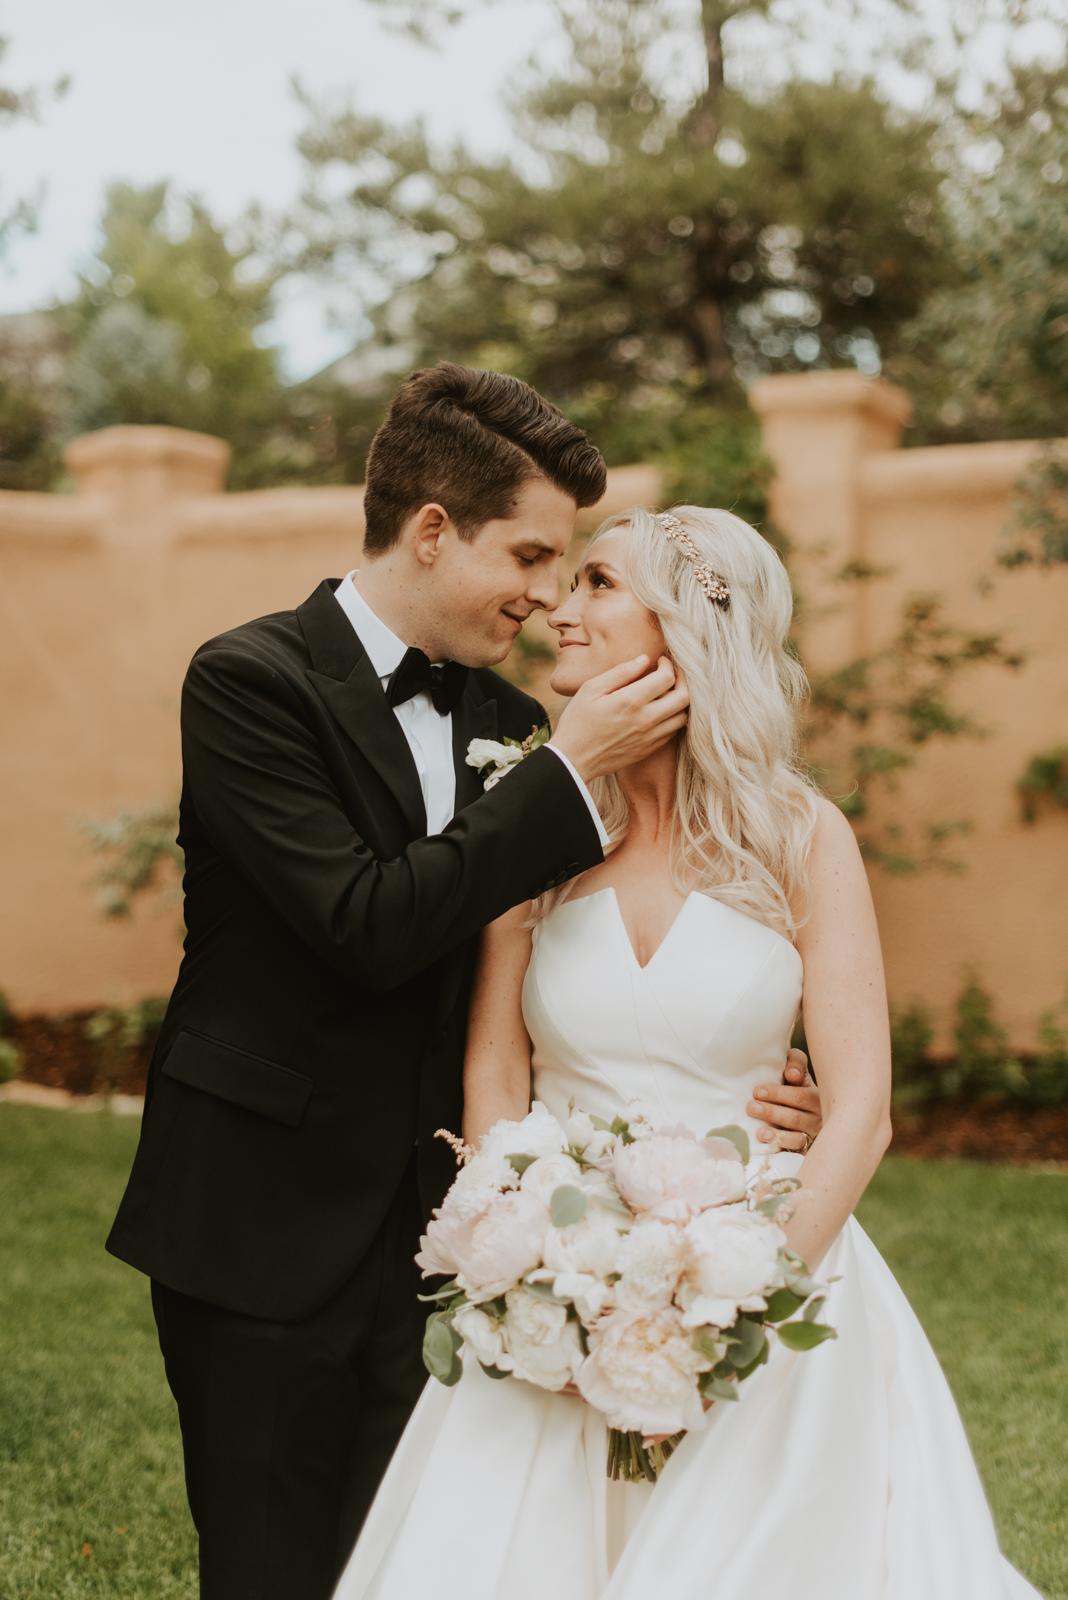 bride + groom portraits at their modern summer wedding at Villa Parker in Colorado.